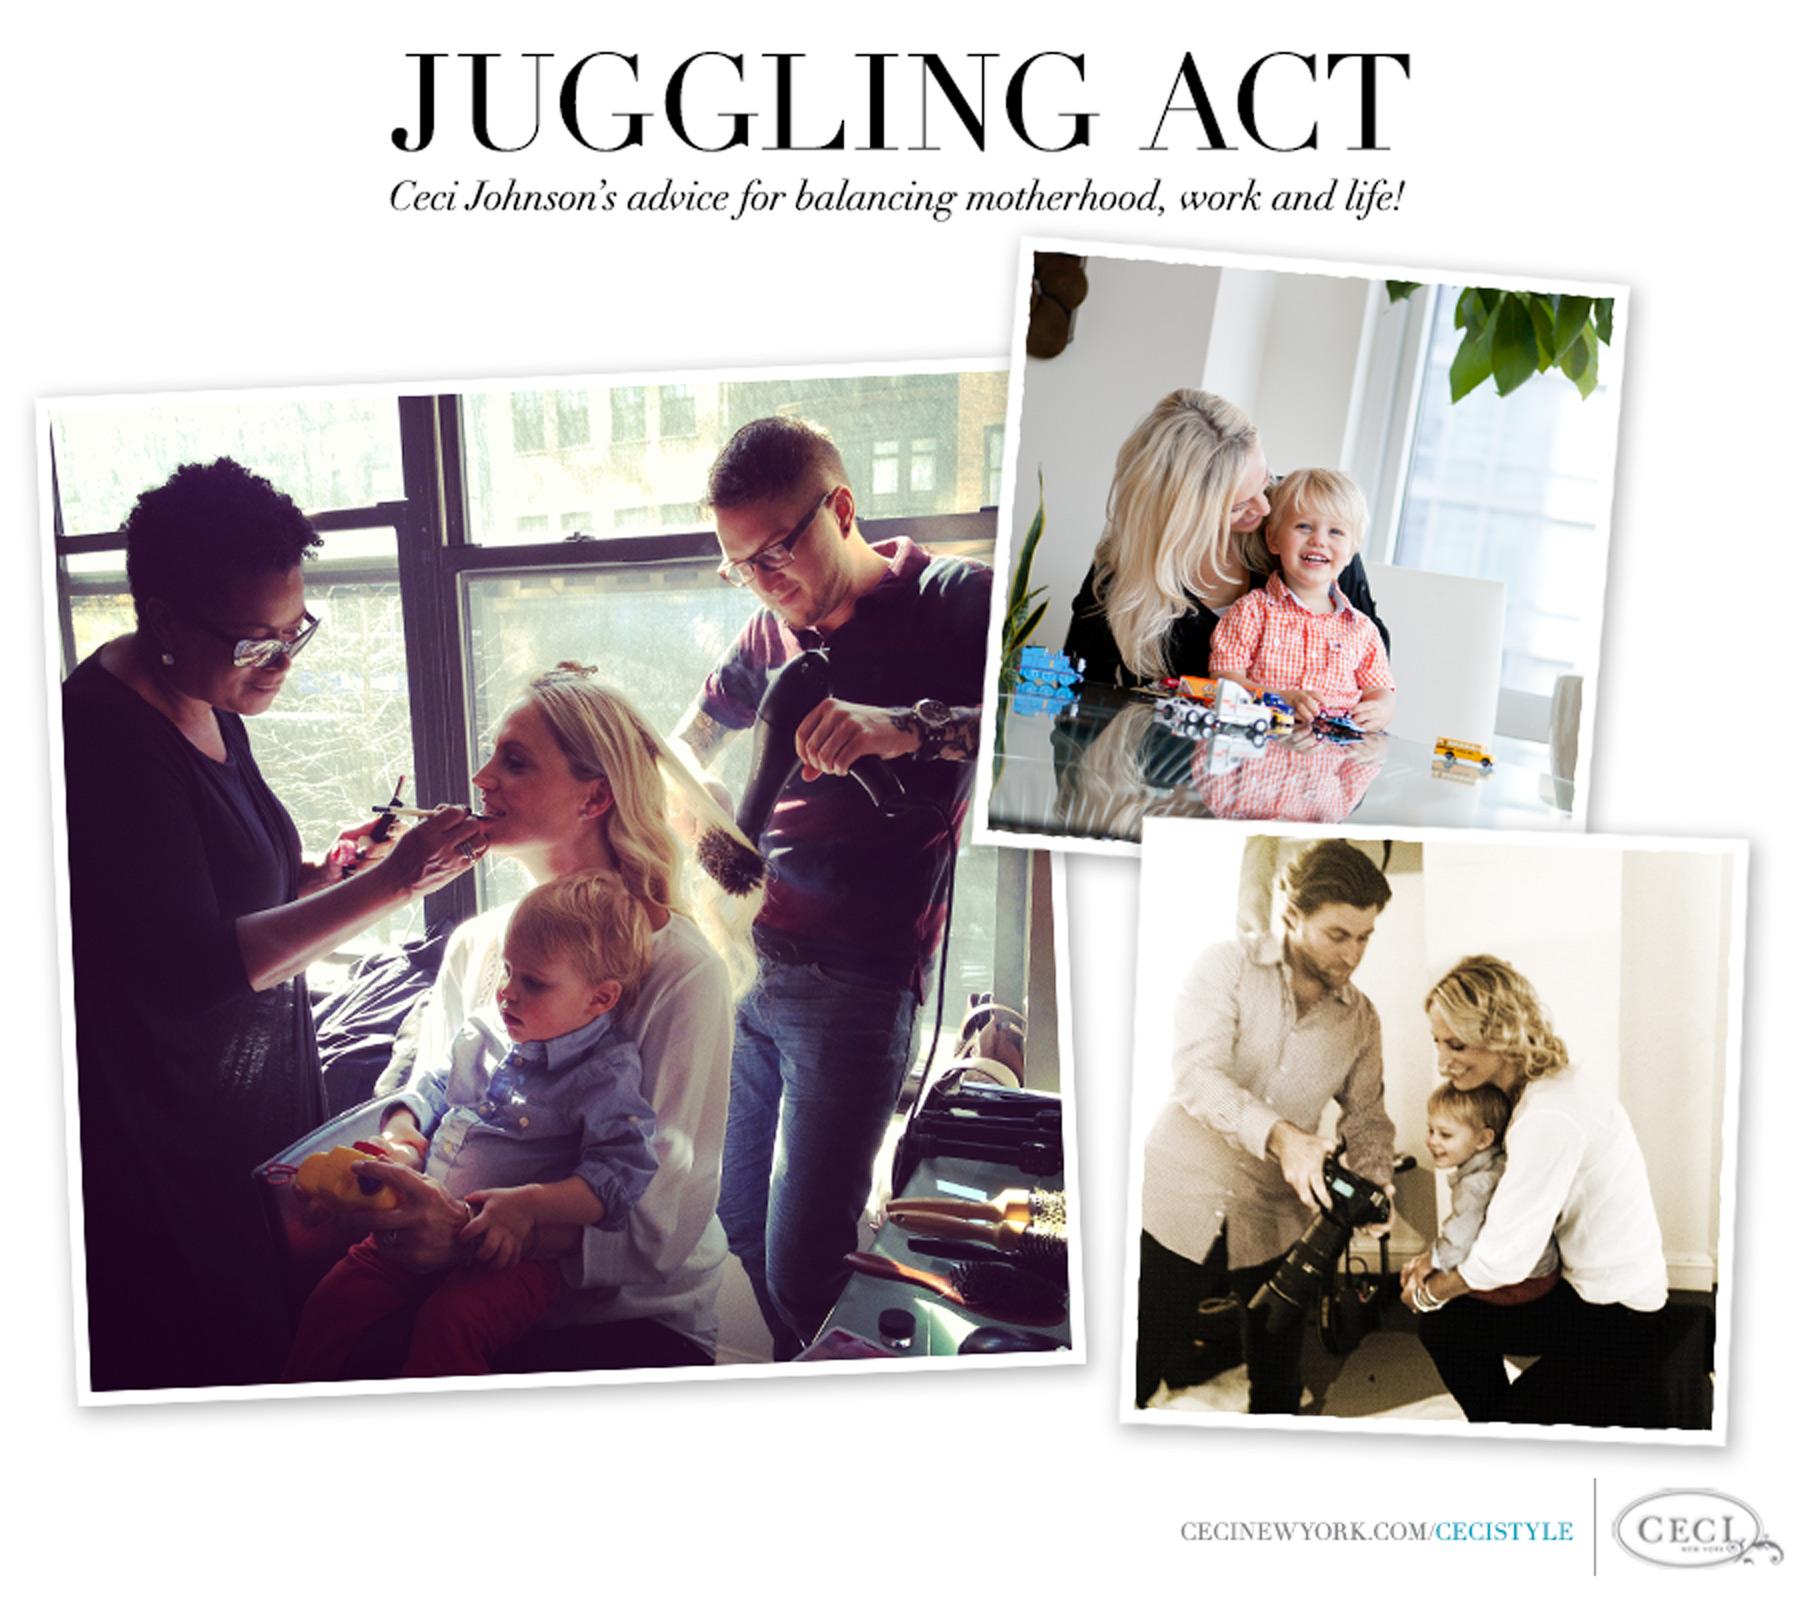 Juggling Act - Ceci Johnson's advice for balancing motherhood, work and life!